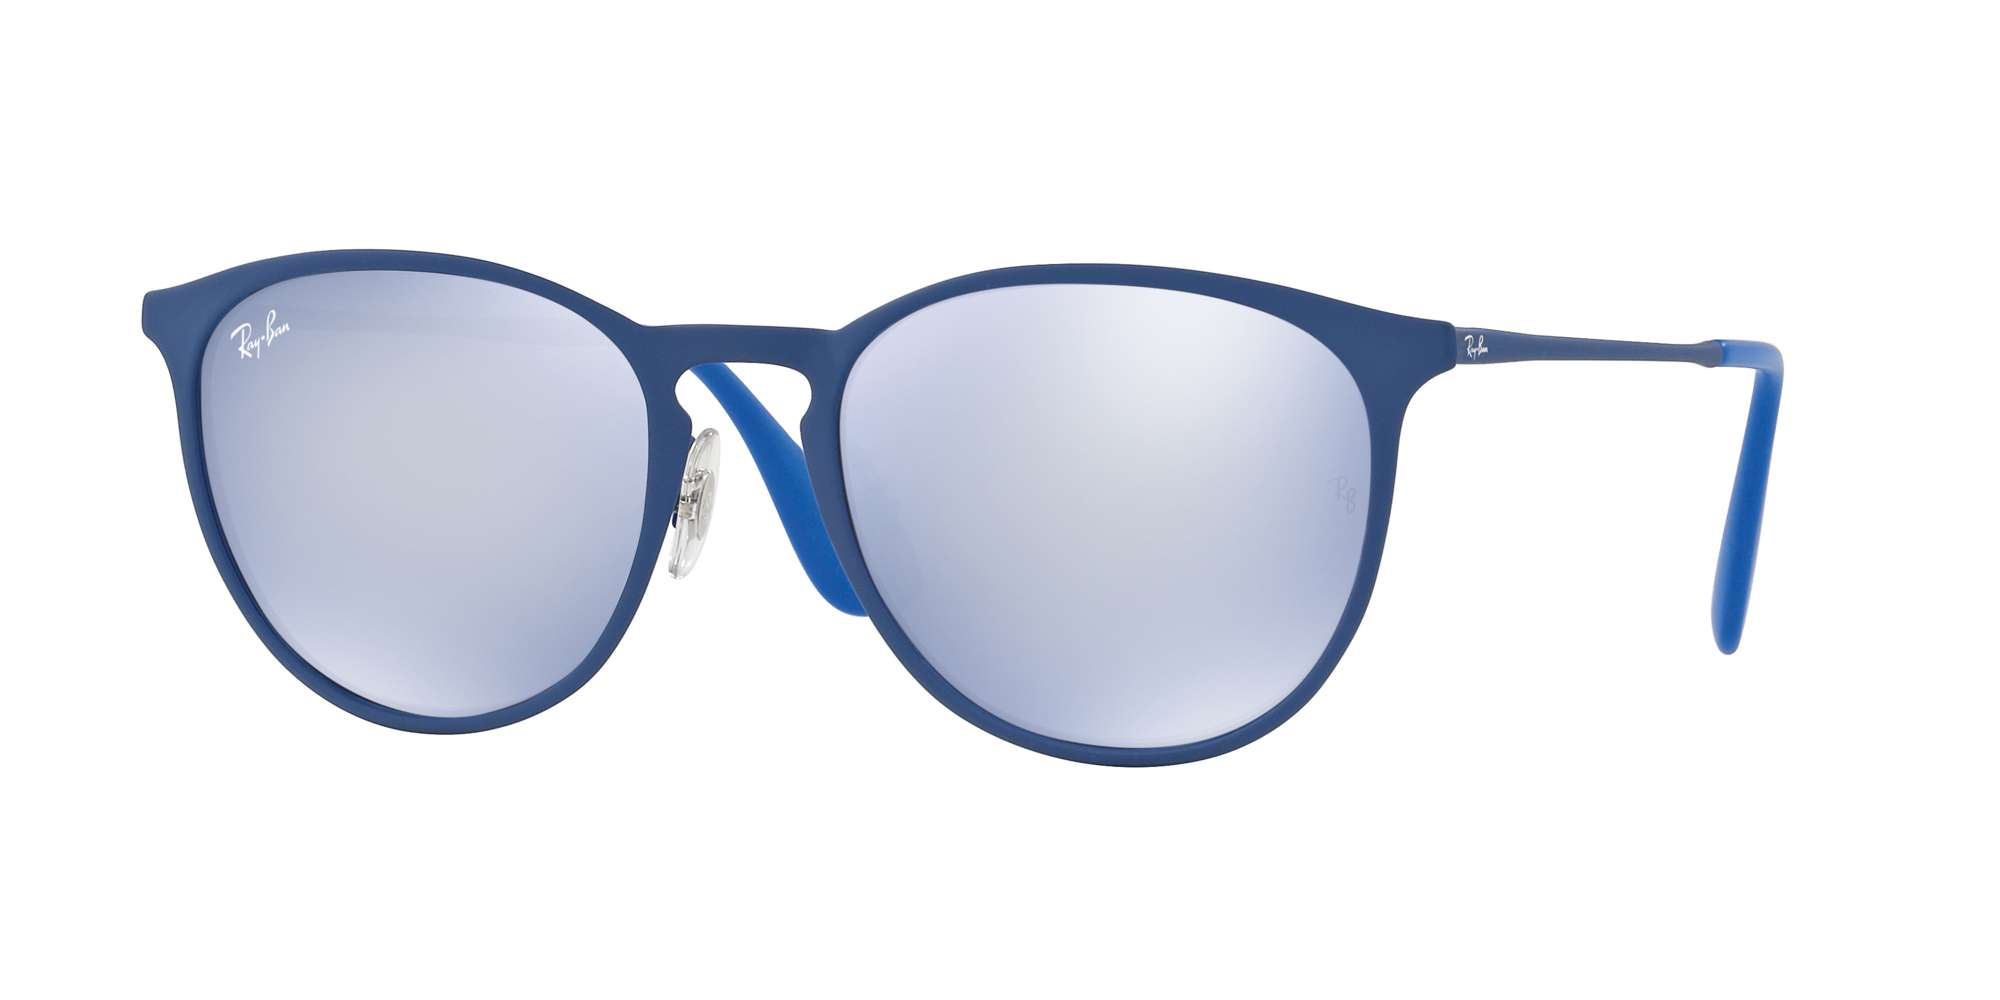 RUBBER ELETRIC BLUE / BLUE LIGHT FLASH GREY lenses